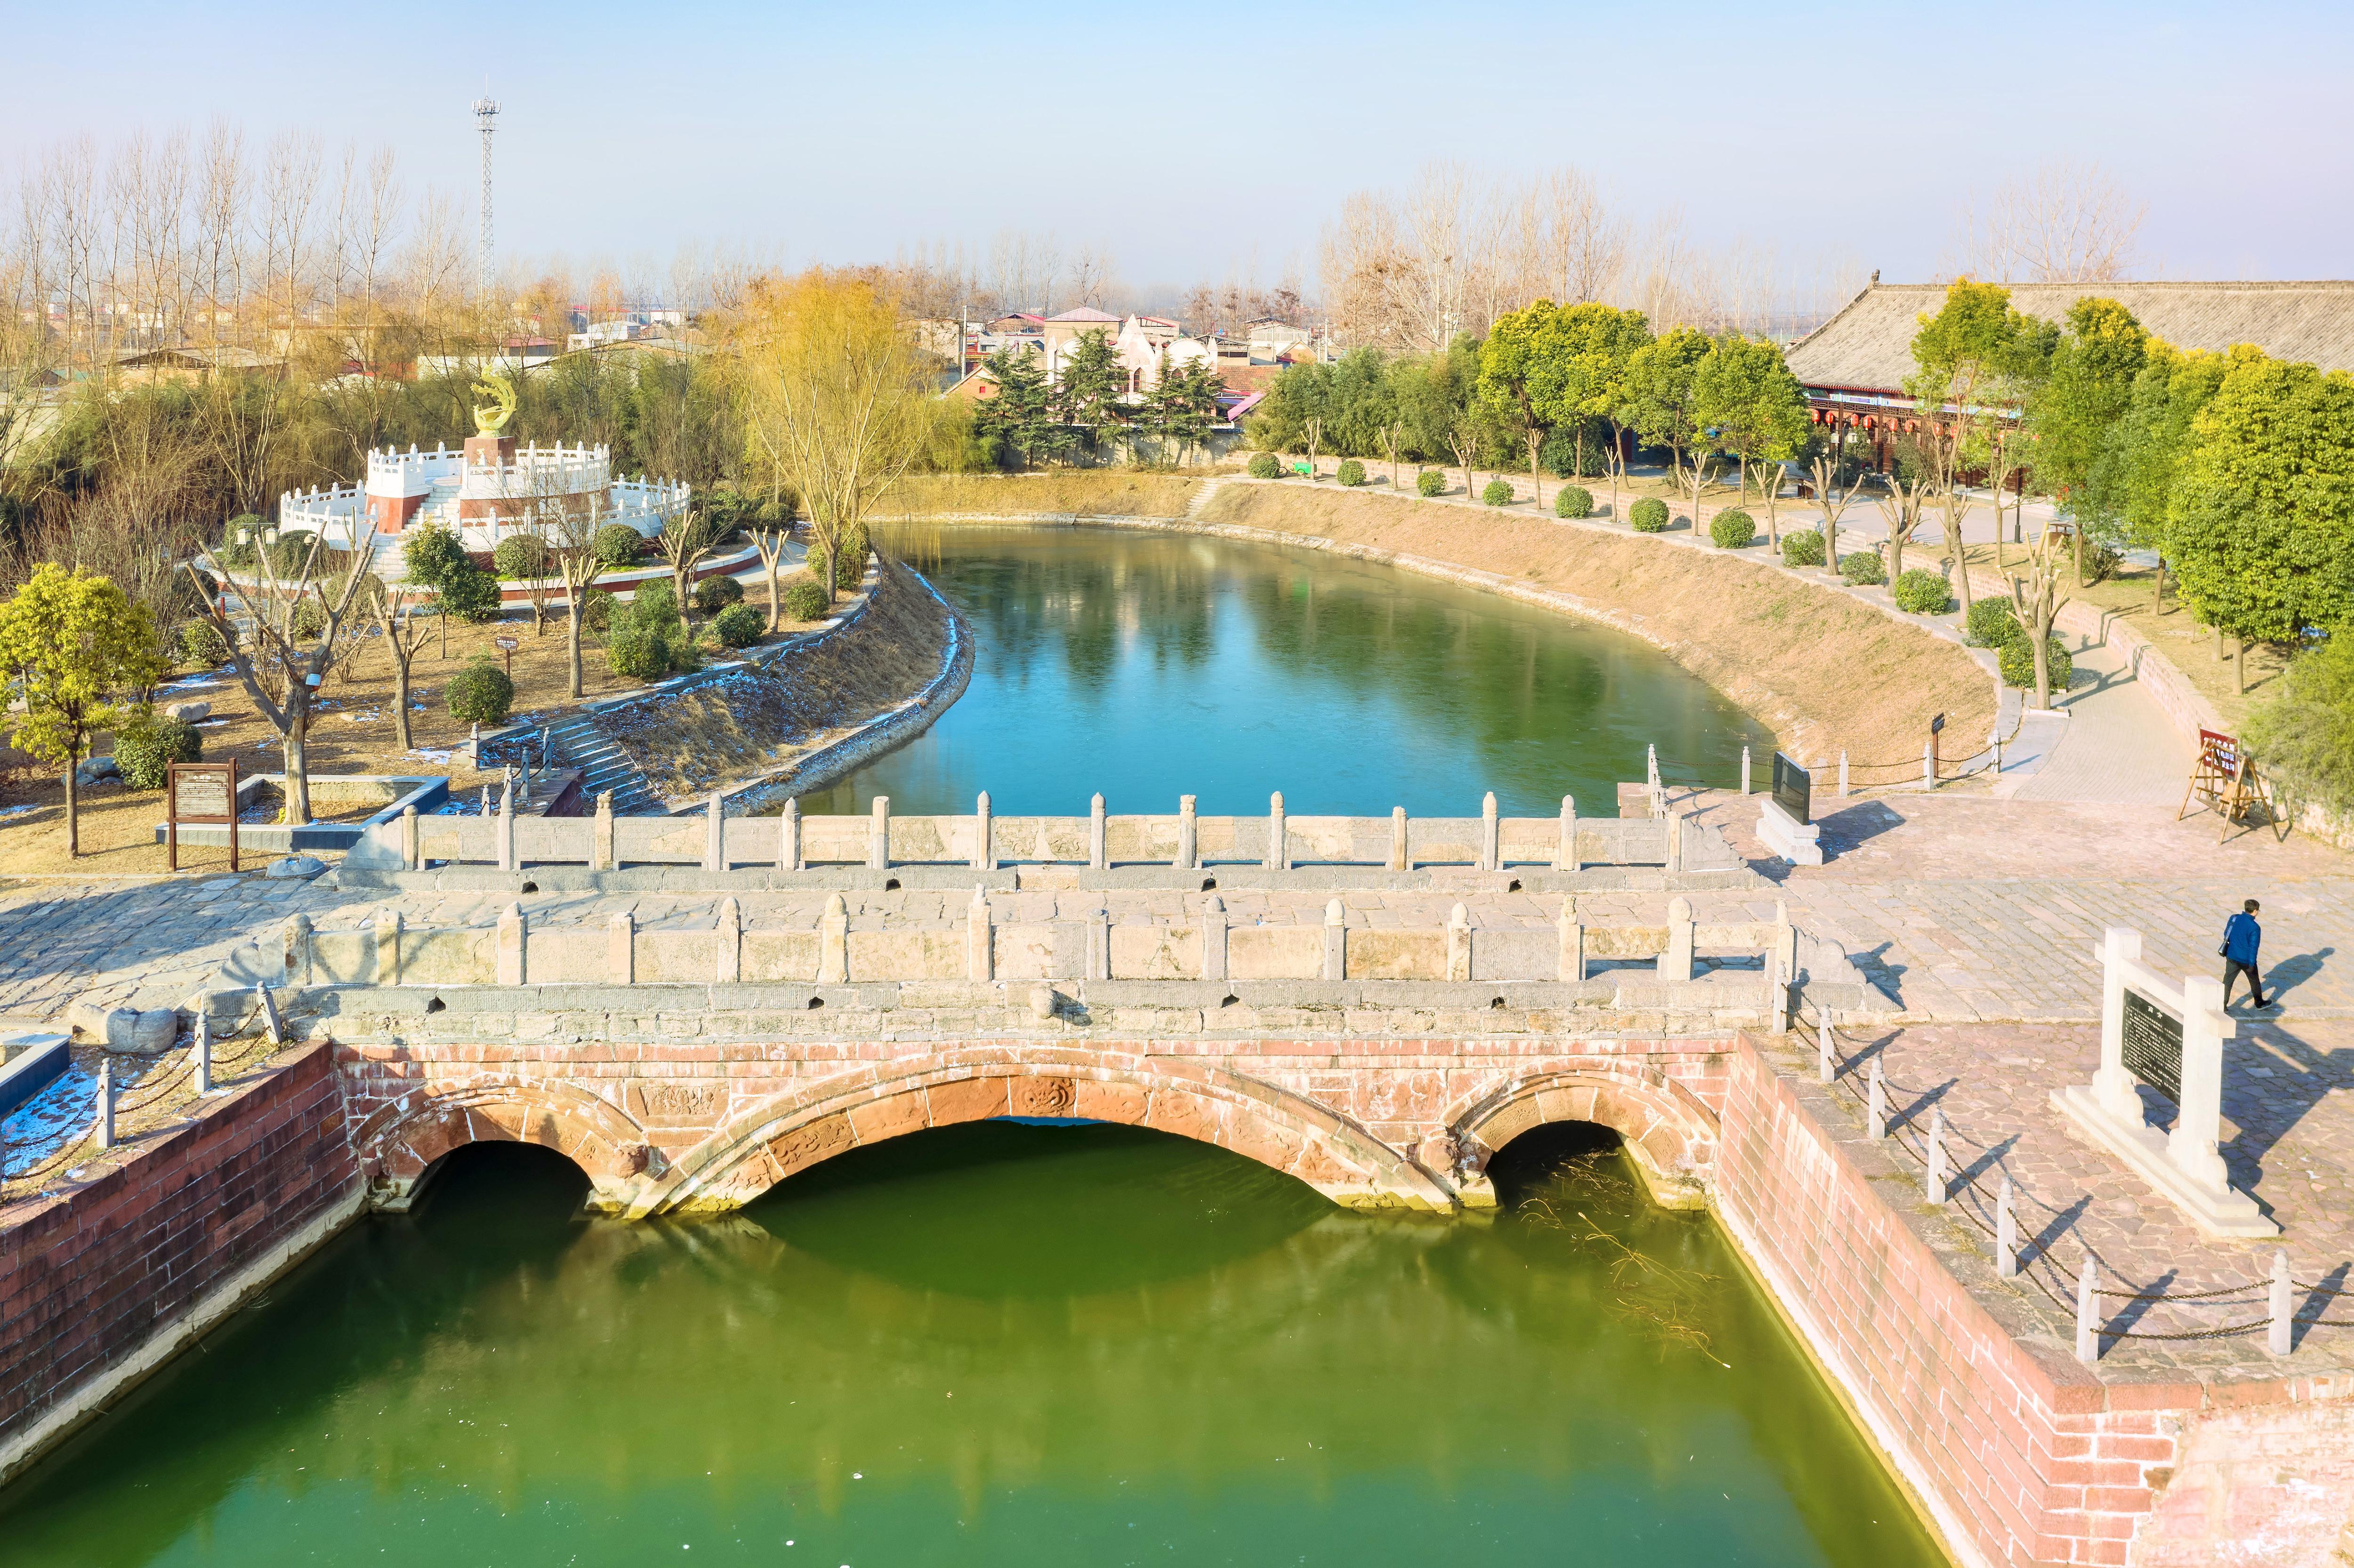 The Little Shang Bridge